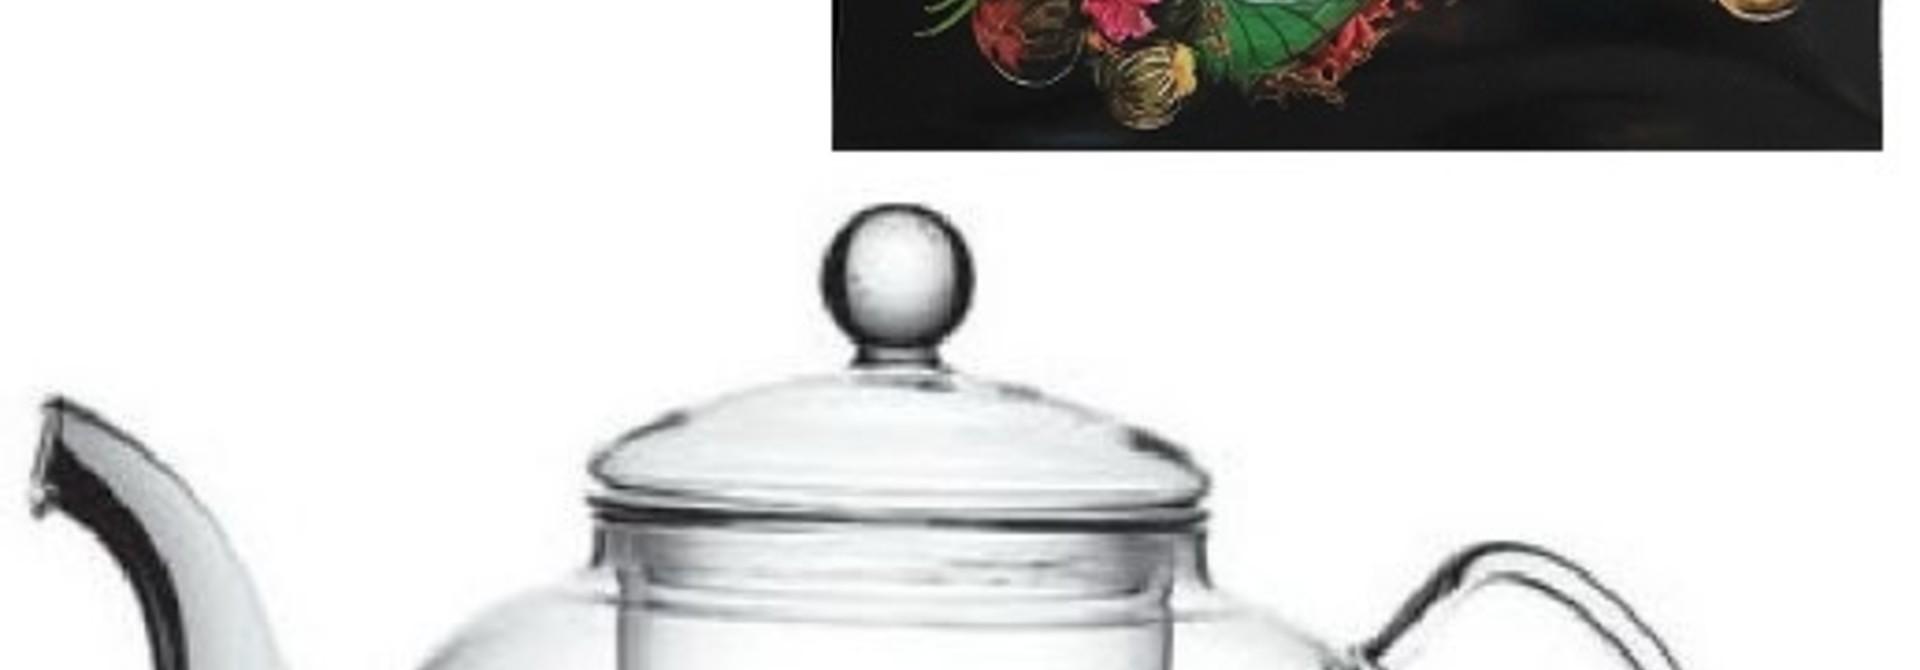 12 Teeblumen + Ching Cha Teekanne für 1 L